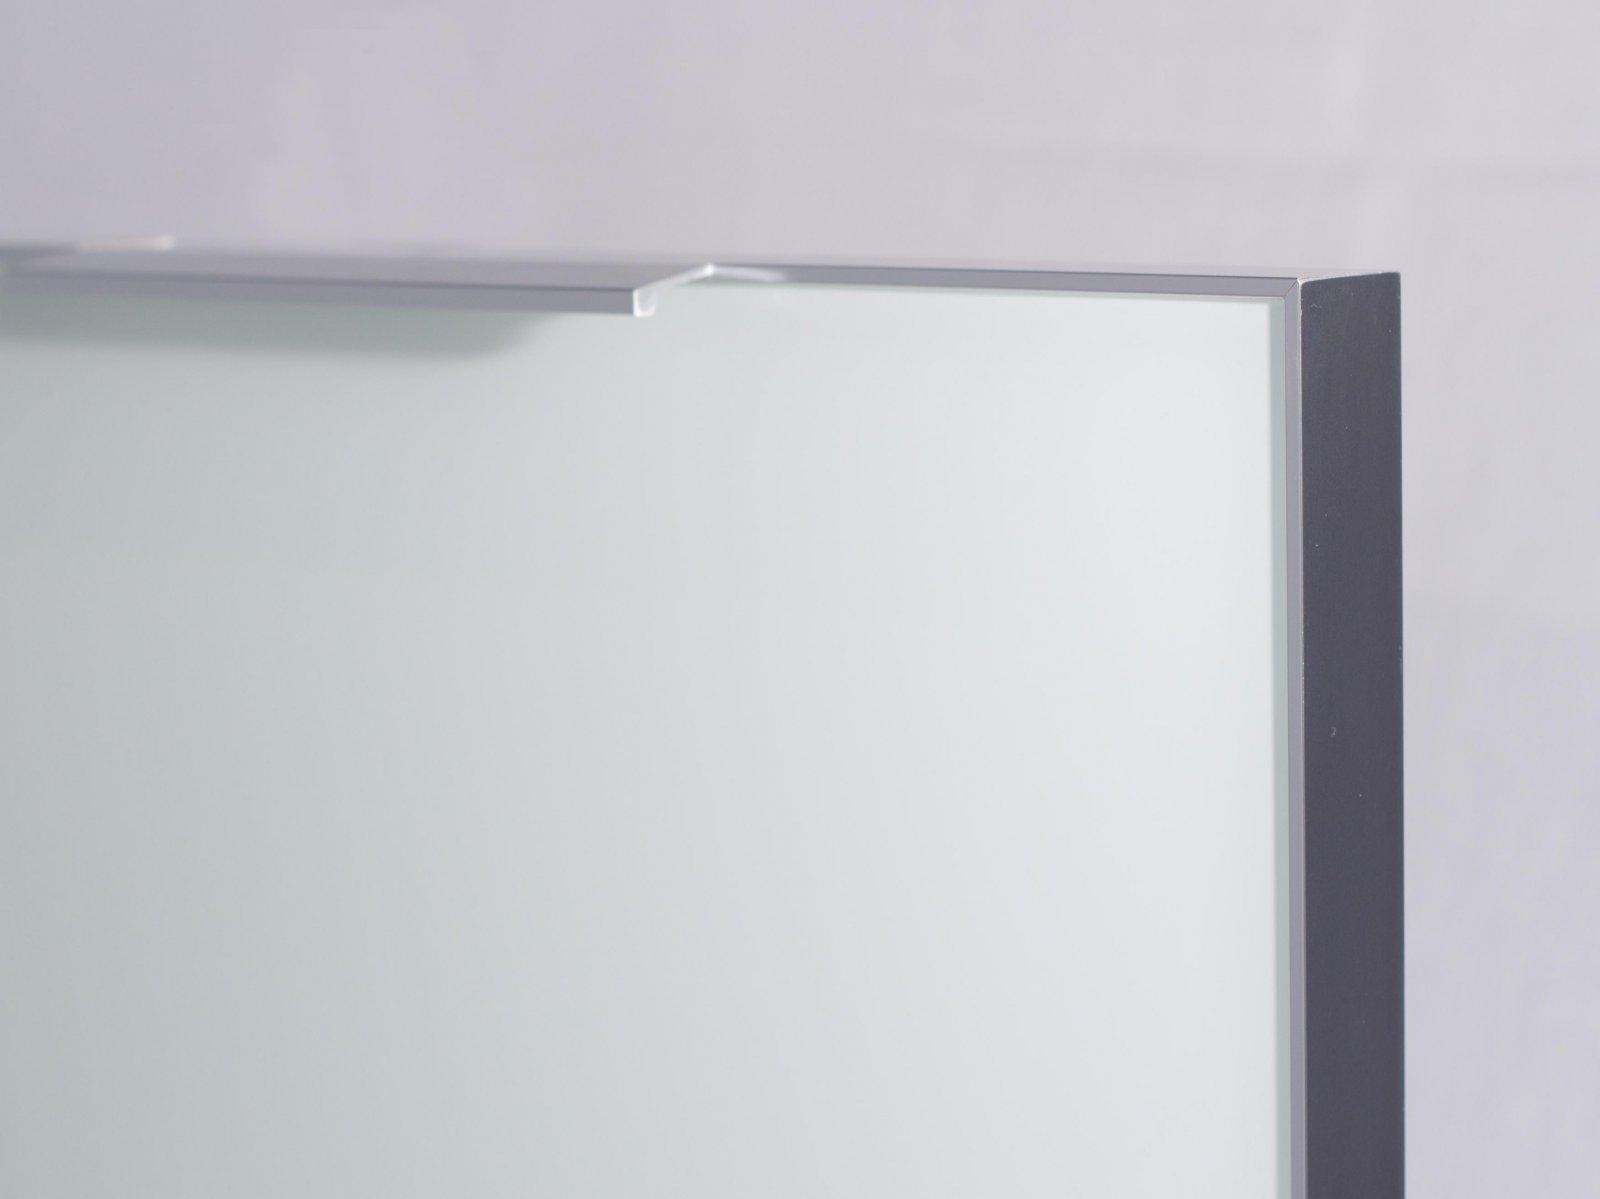 Porta-16 (Perfil V06 brilho + puxador L06 brilho 150mm + vidro lacado branco)